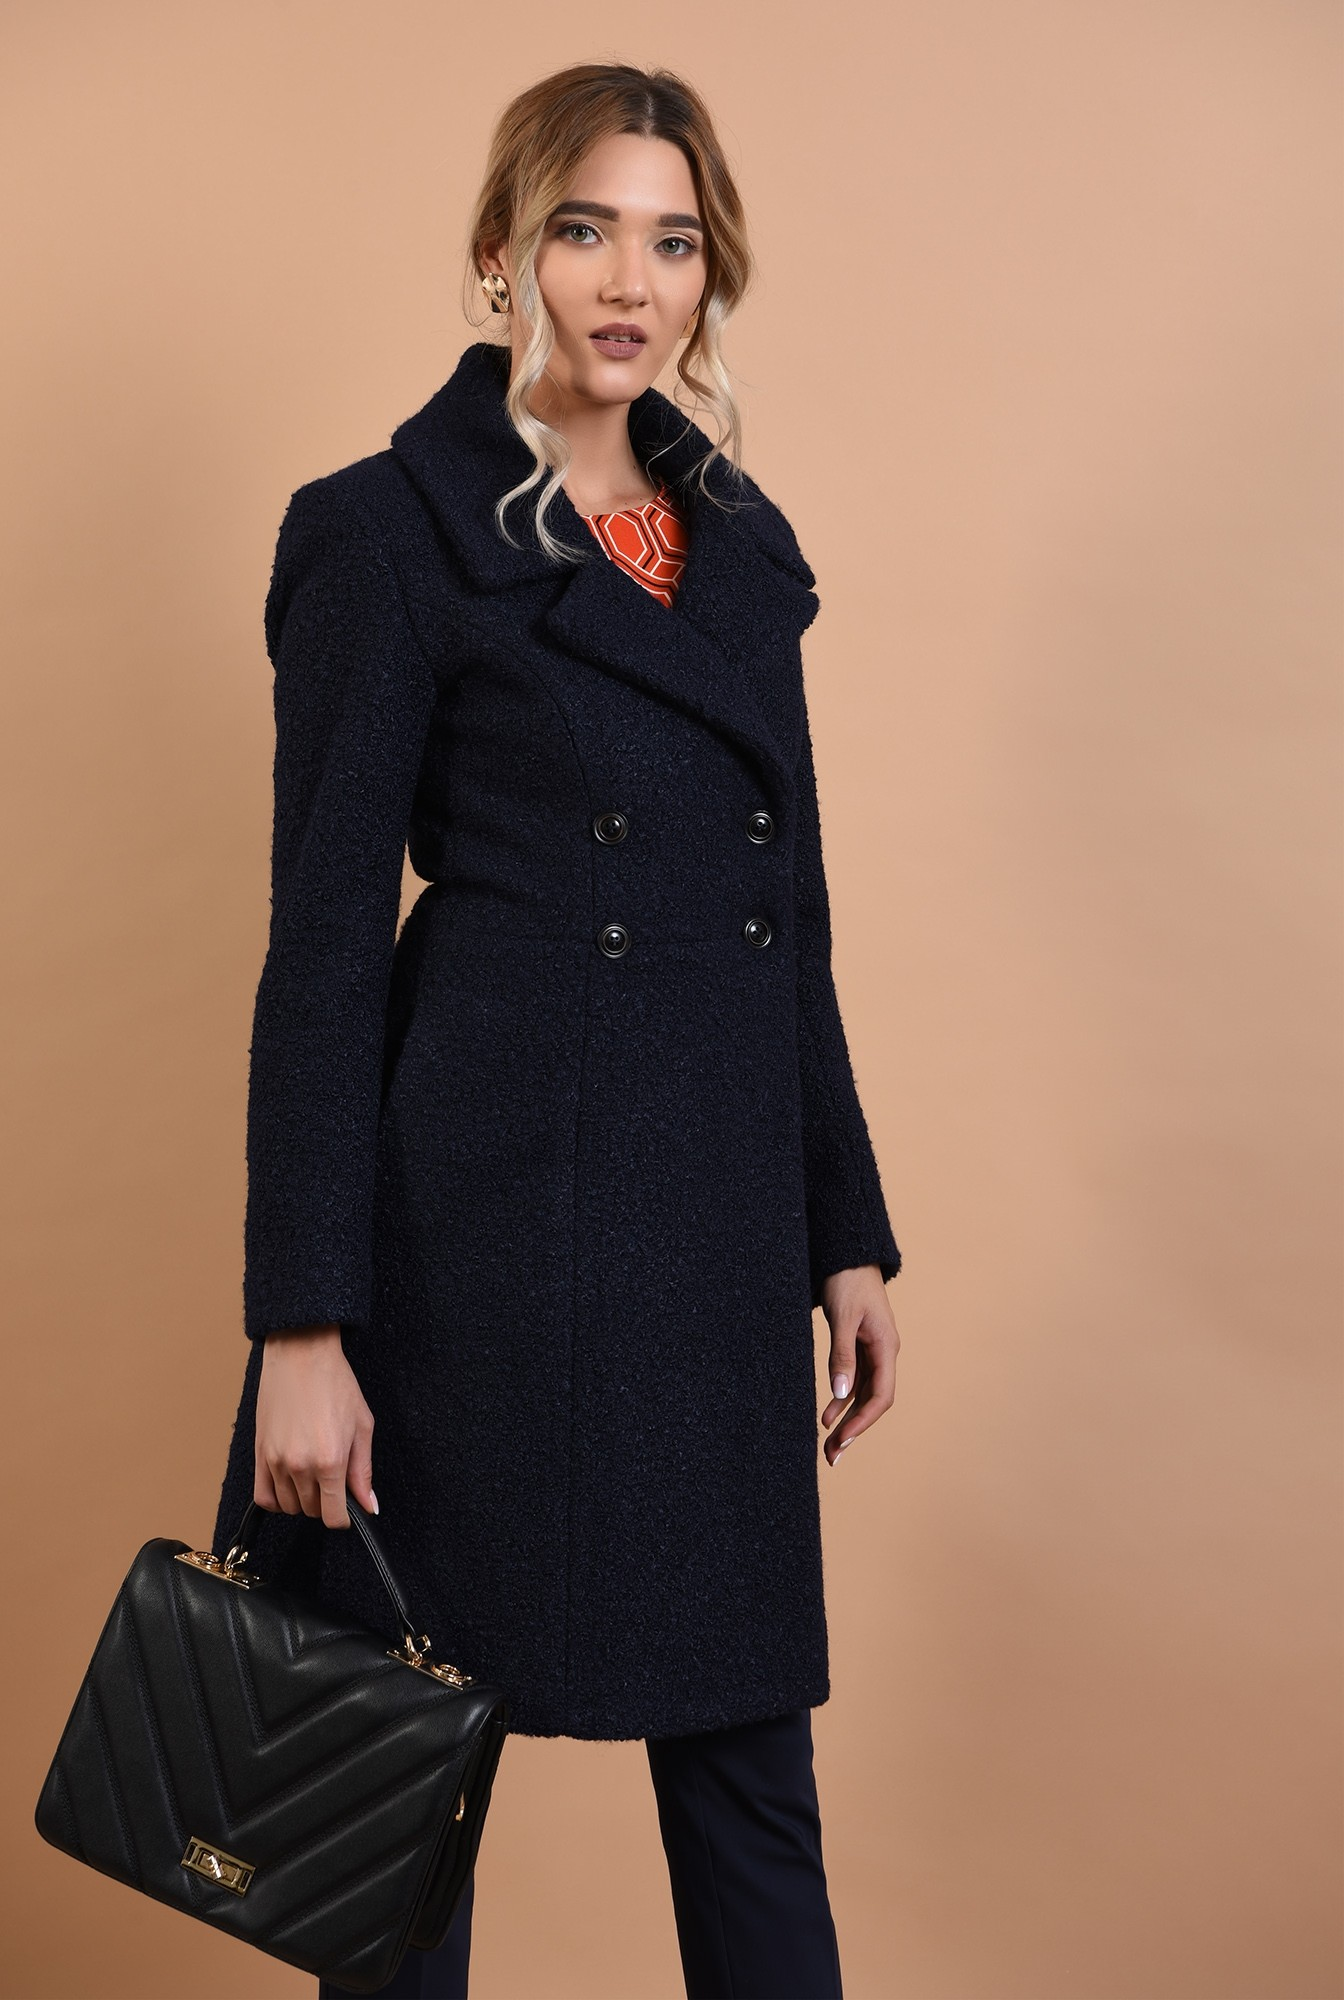 2 - palton bleumarin, cu nasturi, revere crestate, anchior petrecut